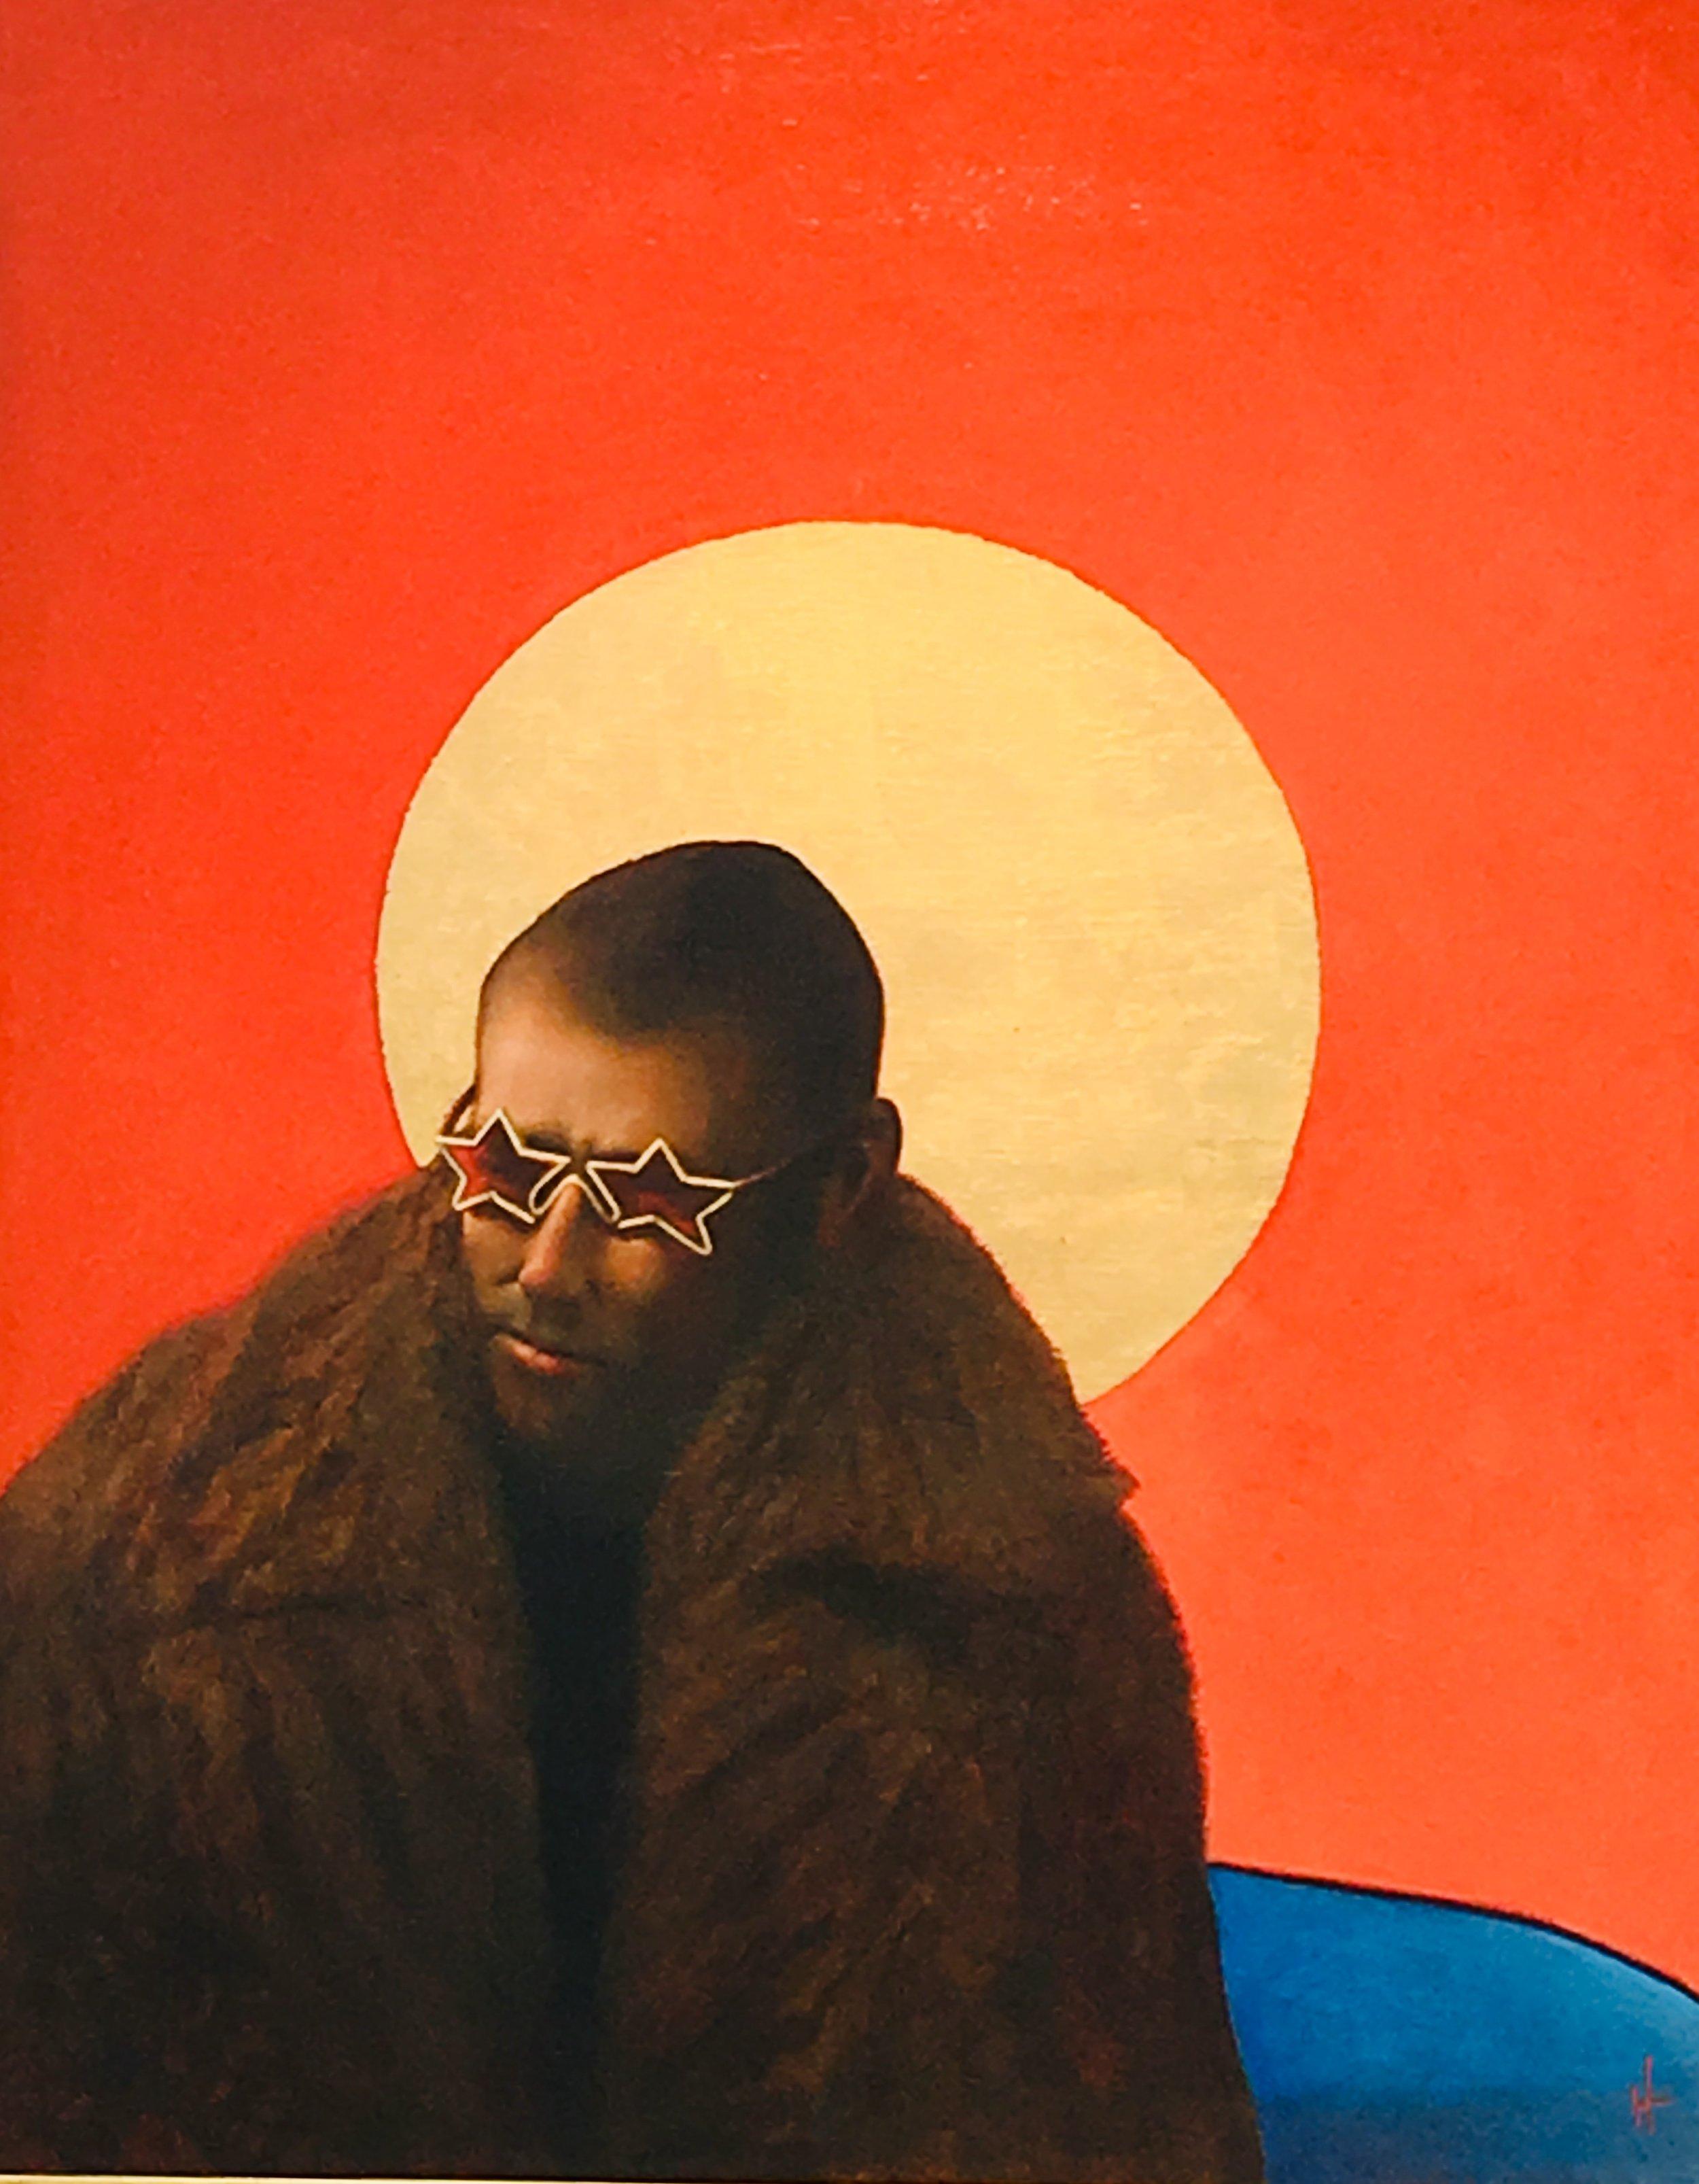 Artist: Kevin Hendley  Title: Star Man  Size:  110 x 88 cm  Medium: Oil on panel  Price: £5950